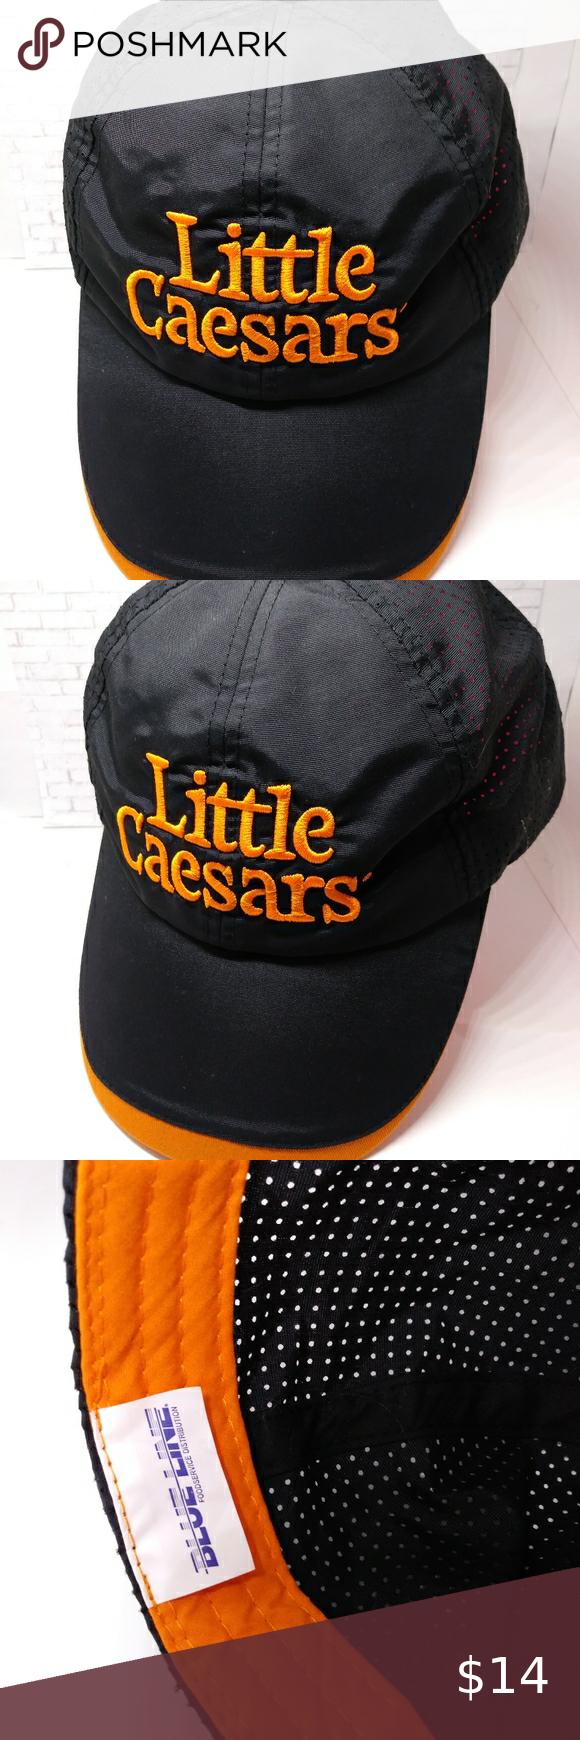 Little Caesar S Pizza Employee Hat Black Uniform Little Caesars Pizza Hat Black Cap Employee Work Uniform Adjustable Pre Own Black Cap Pizza Hat Work Uniforms